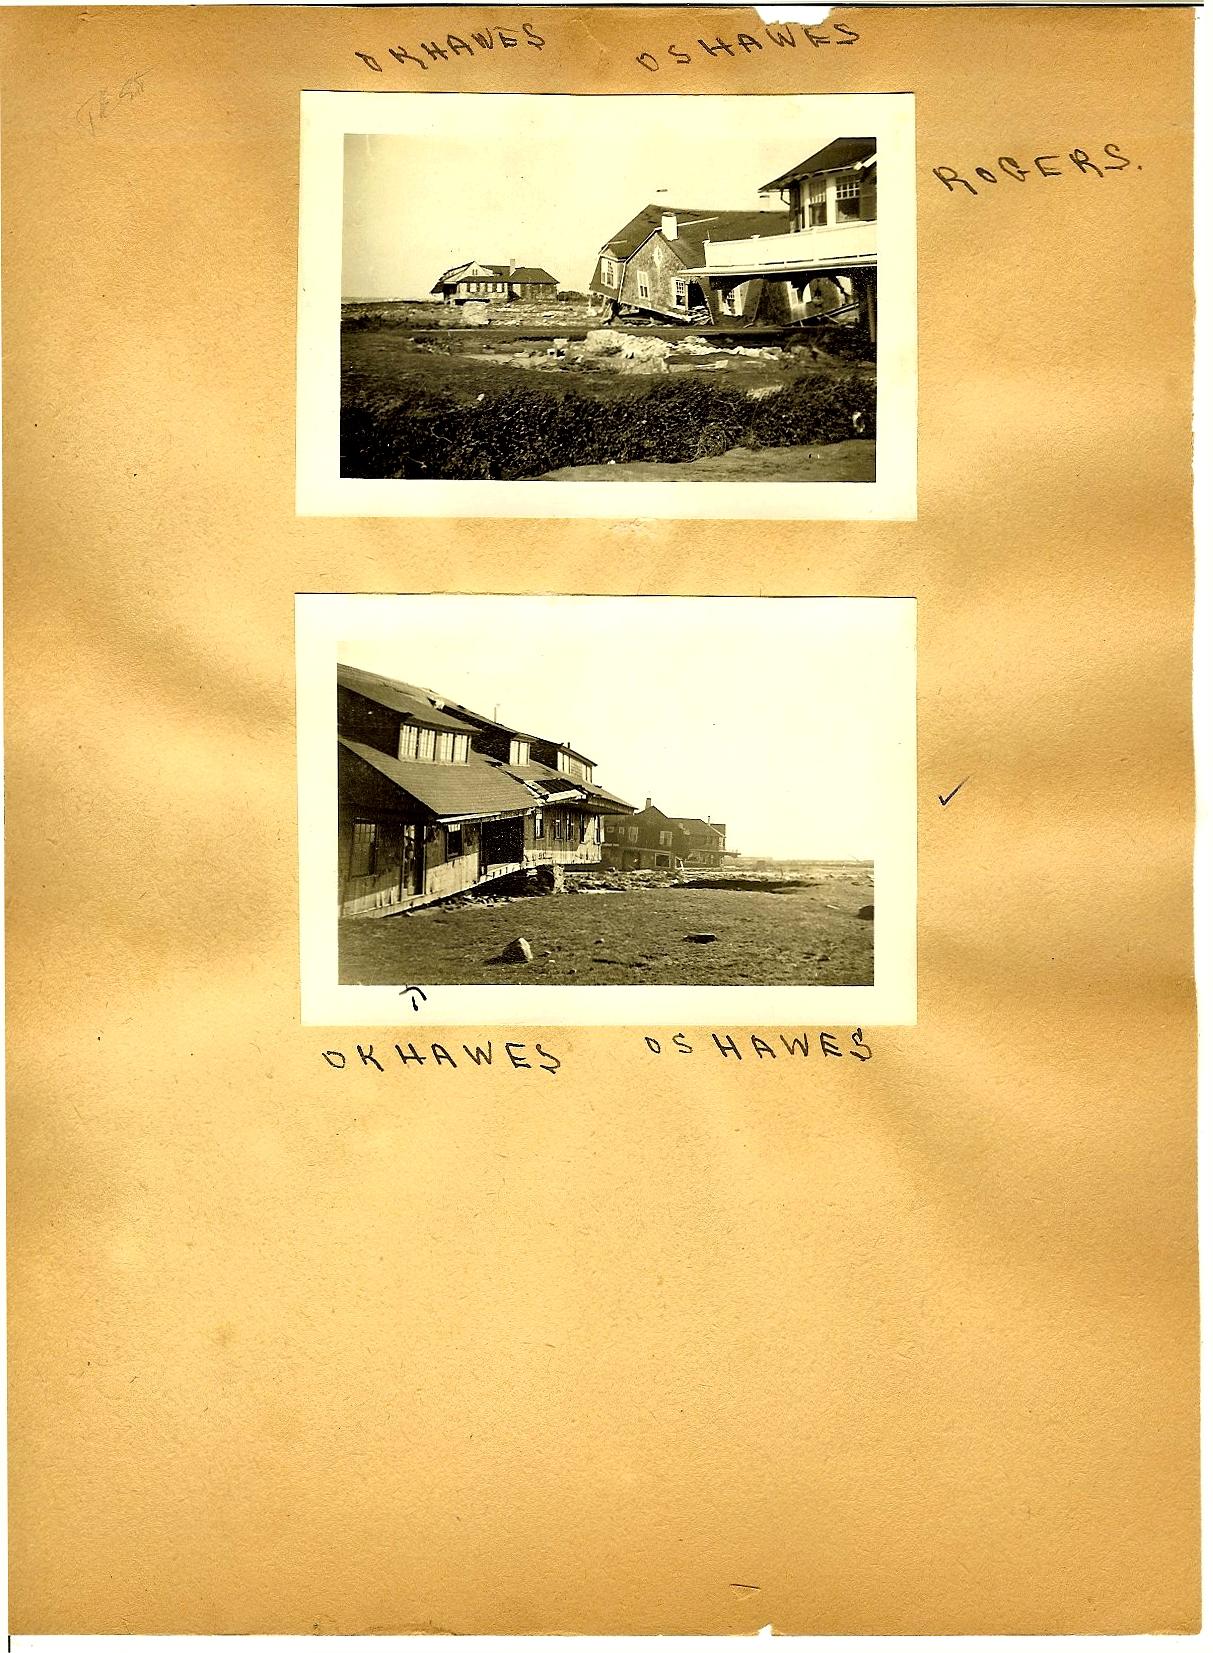 The 1938 Hurricane photos p27